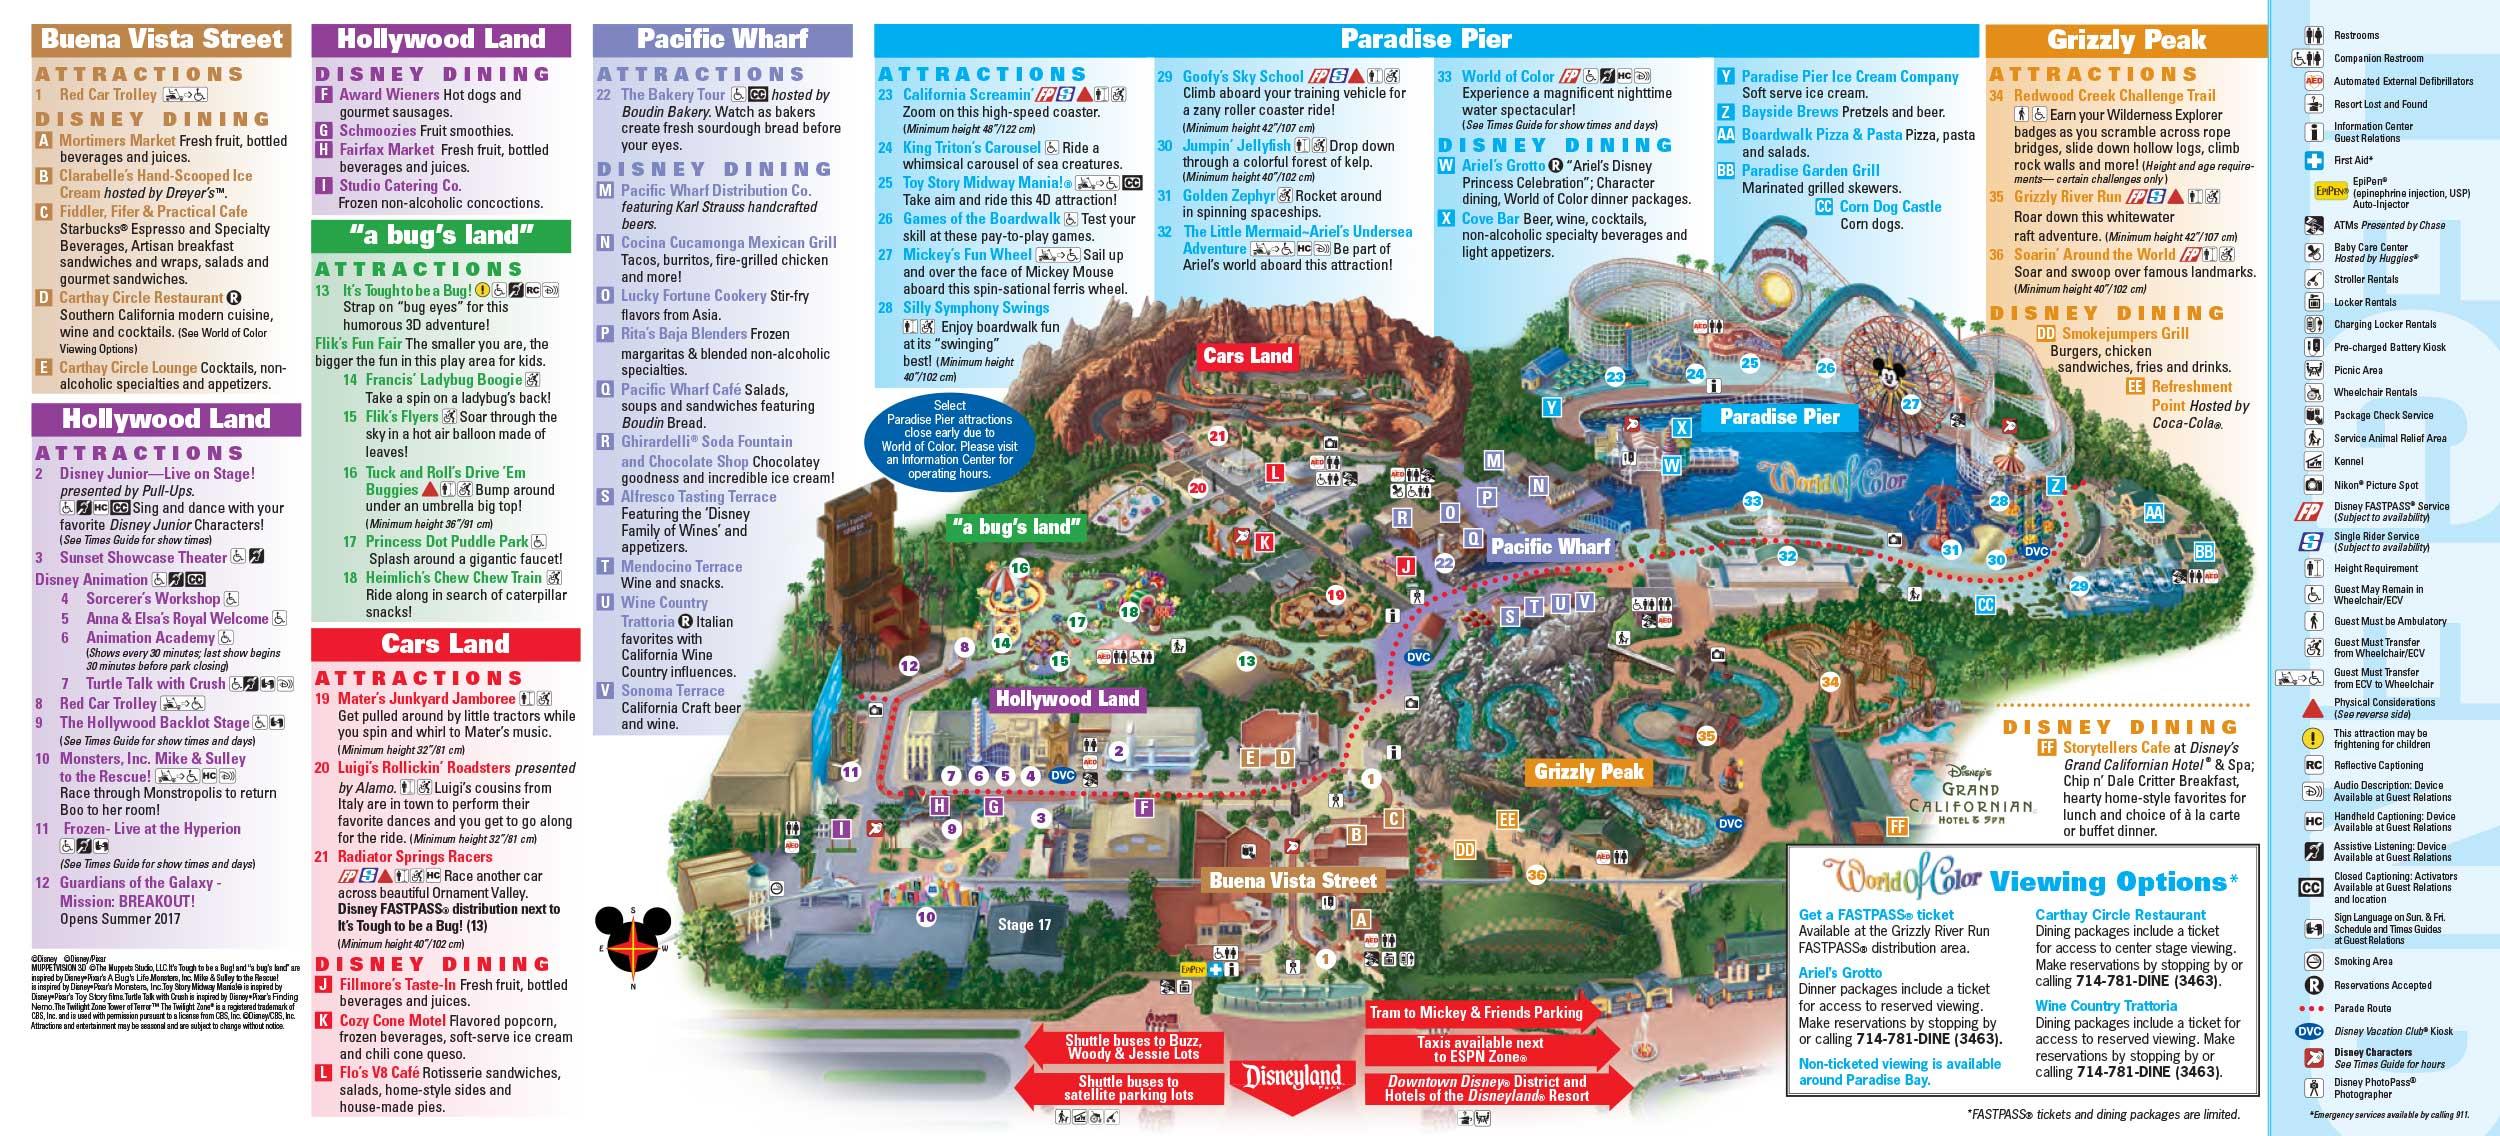 Disneyland Park Map In California, Map Of Disneyland - California Attractions Map